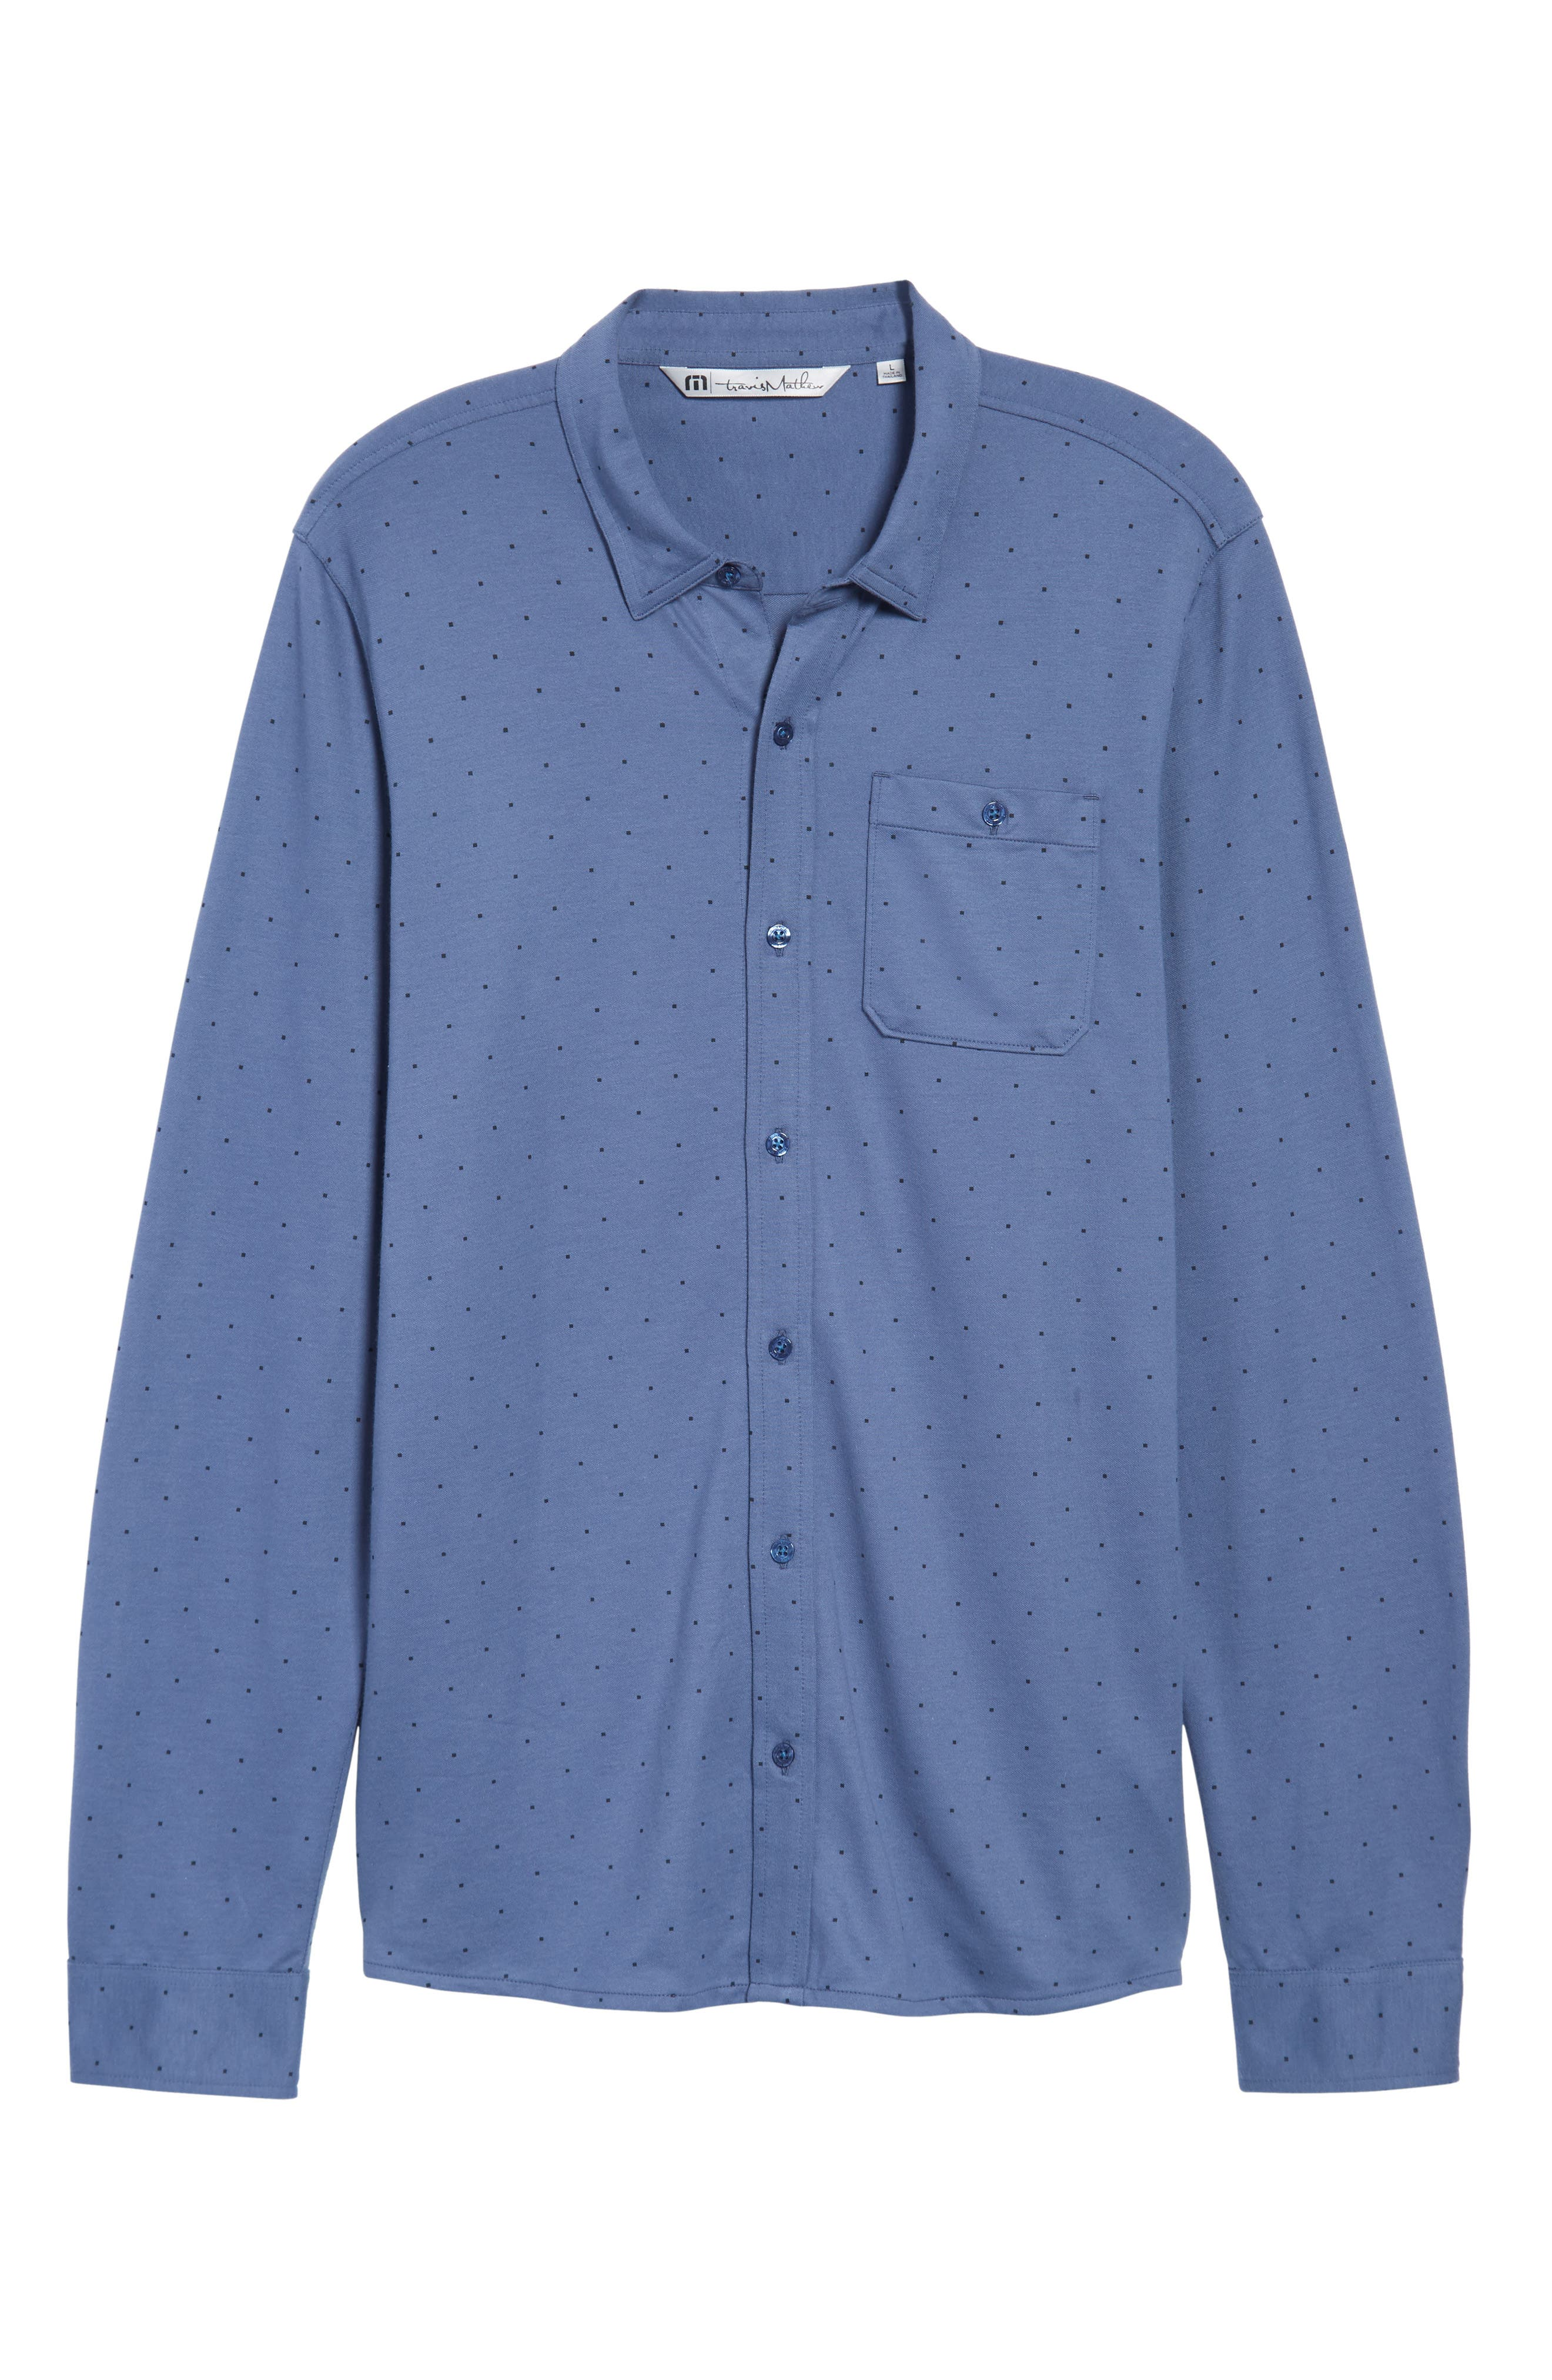 Randy Square Dot Sport Shirt,                             Alternate thumbnail 6, color,                             Vintage Indigo